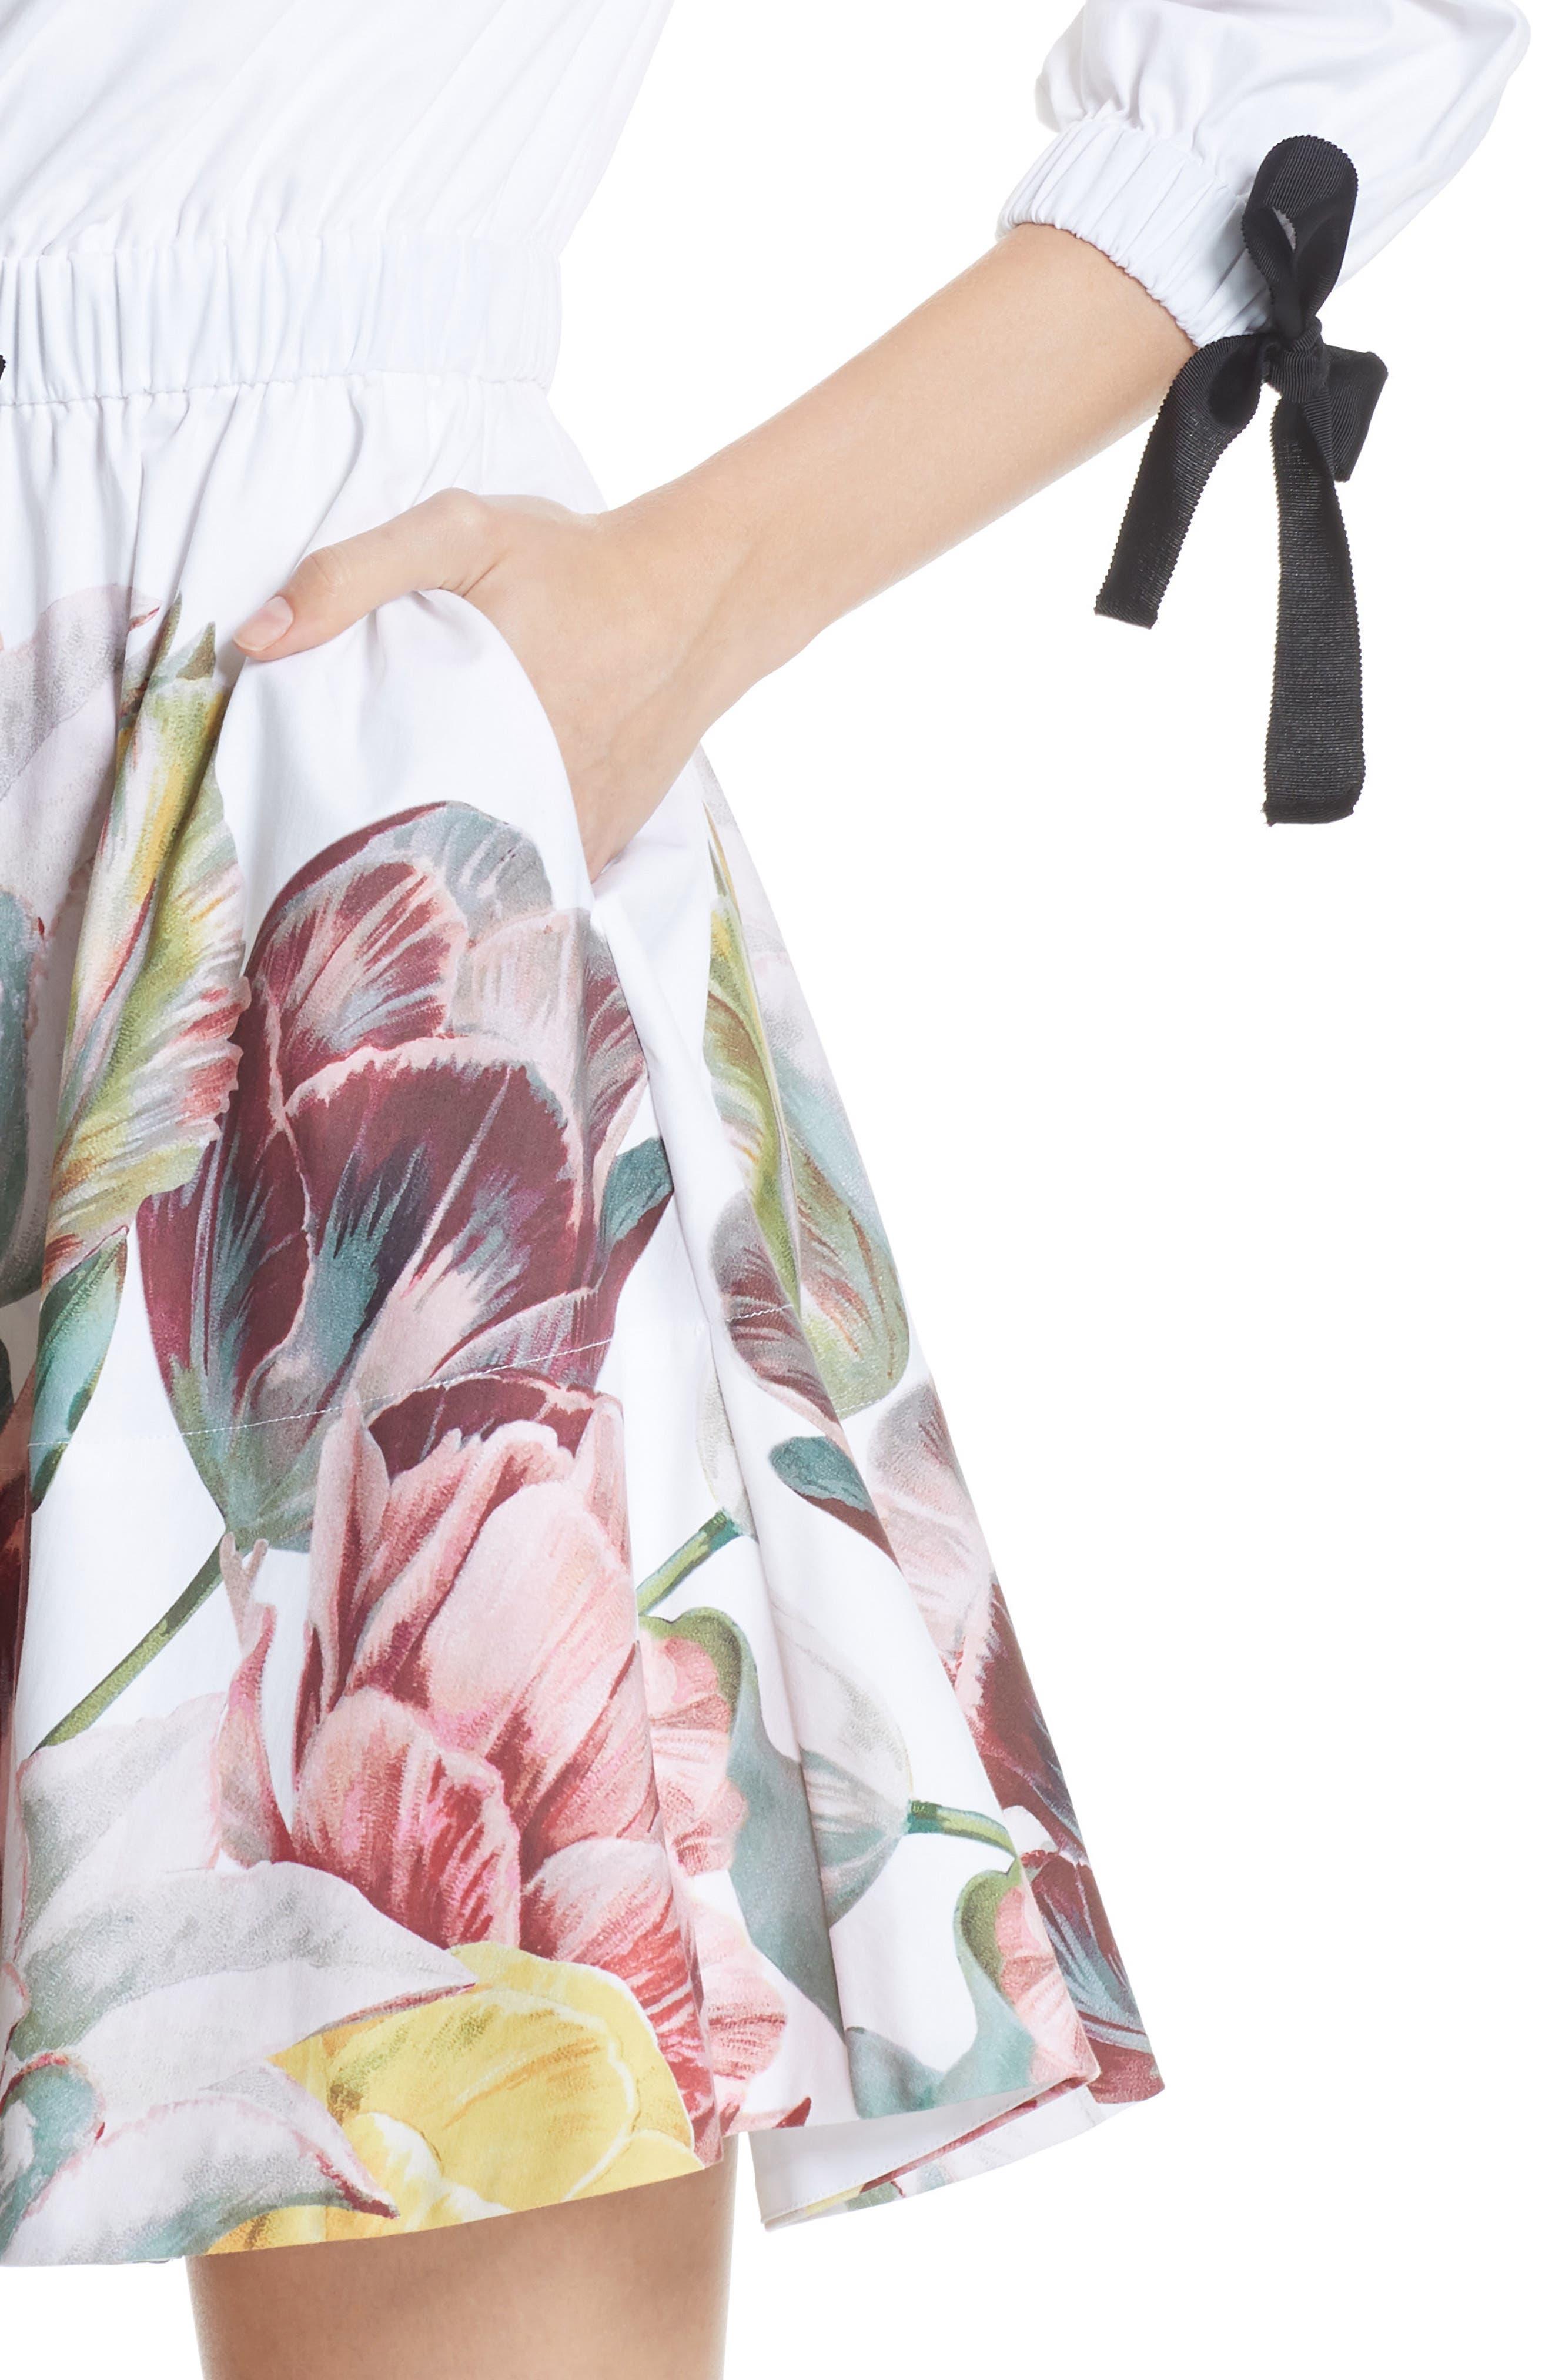 Tranquility Stretch Cotton Dress,                             Alternate thumbnail 4, color,                             110